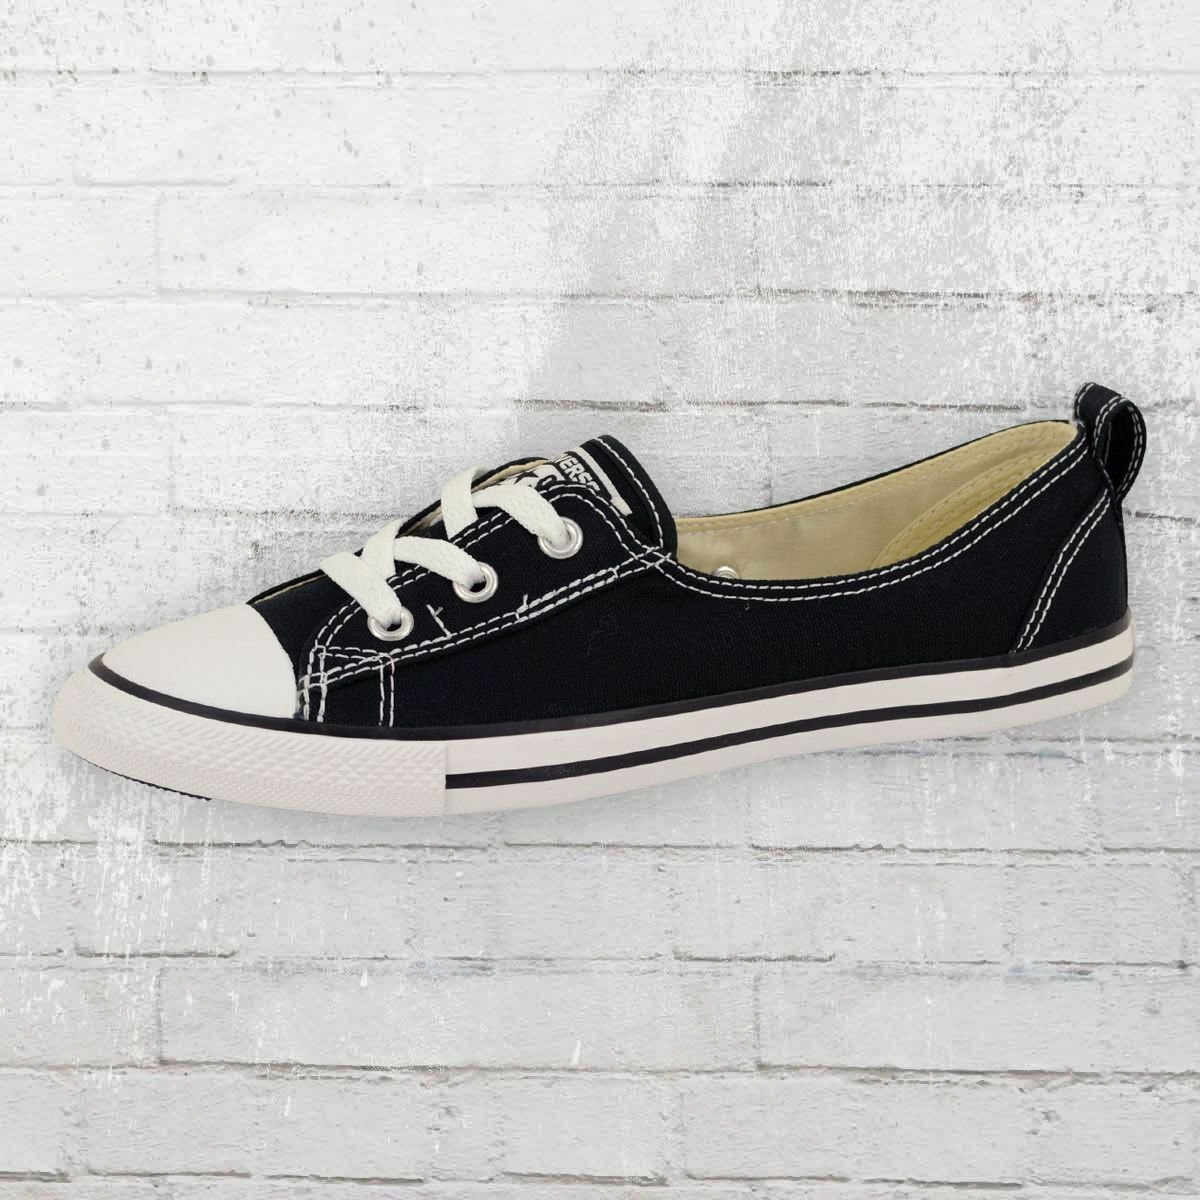 Converse Damen Ballerina CT Ballet Lace 547162 C Schuhe schwarz Frauen Sneaker